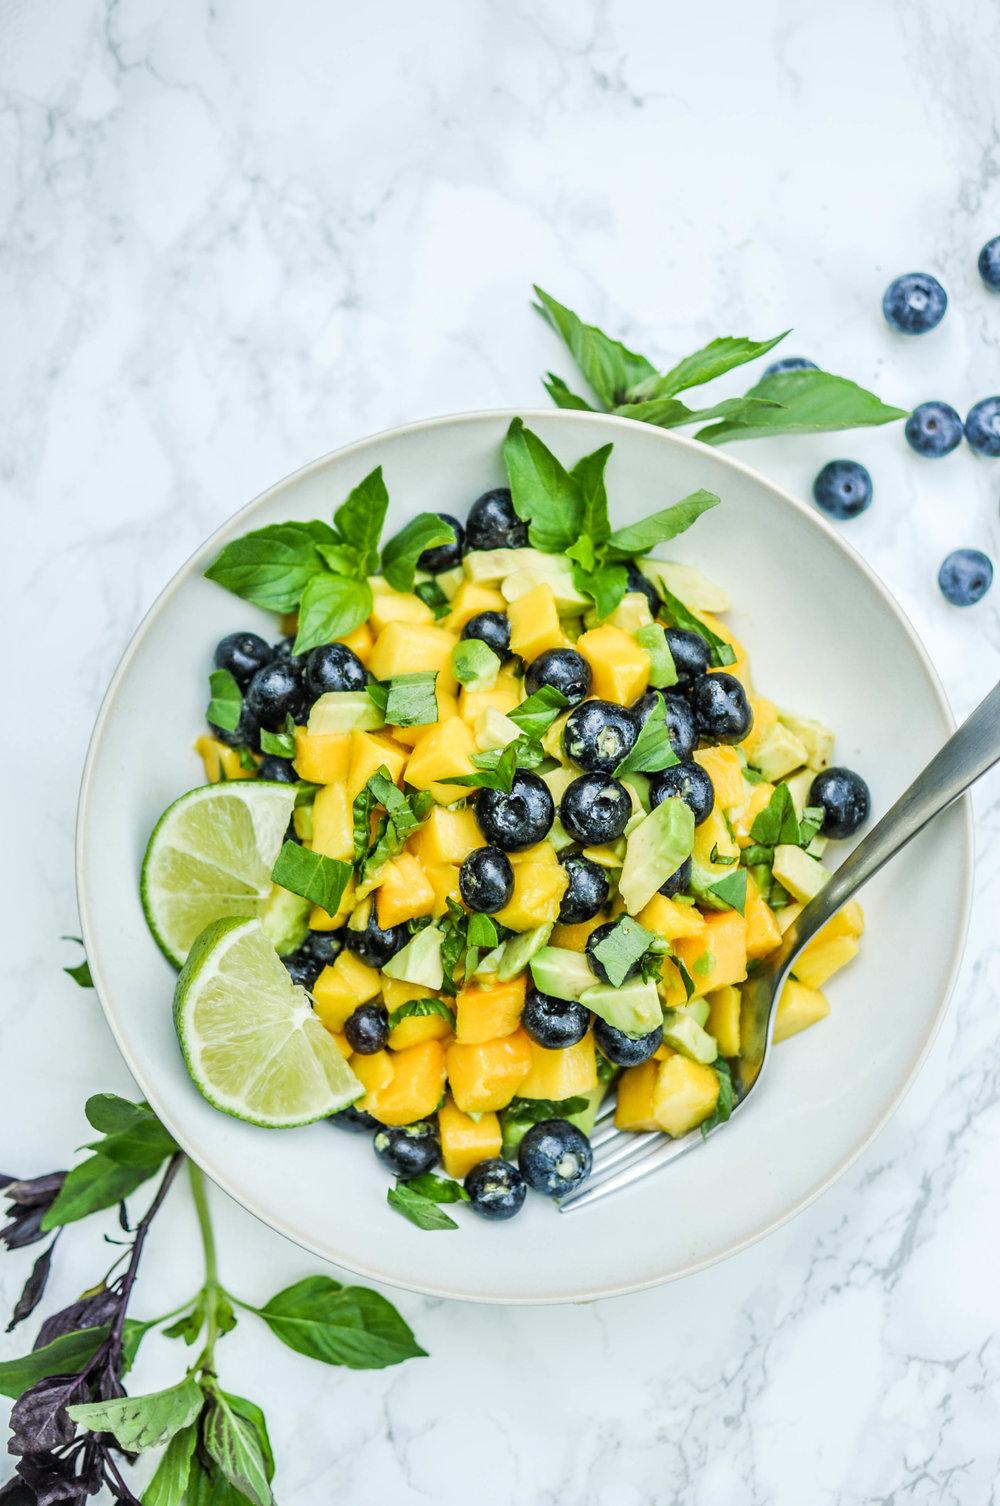 Mango Avocado Salad with Blueberries, Lime Juice, & Herbs. Vegan, Vegetarian, Quick, & Easy.